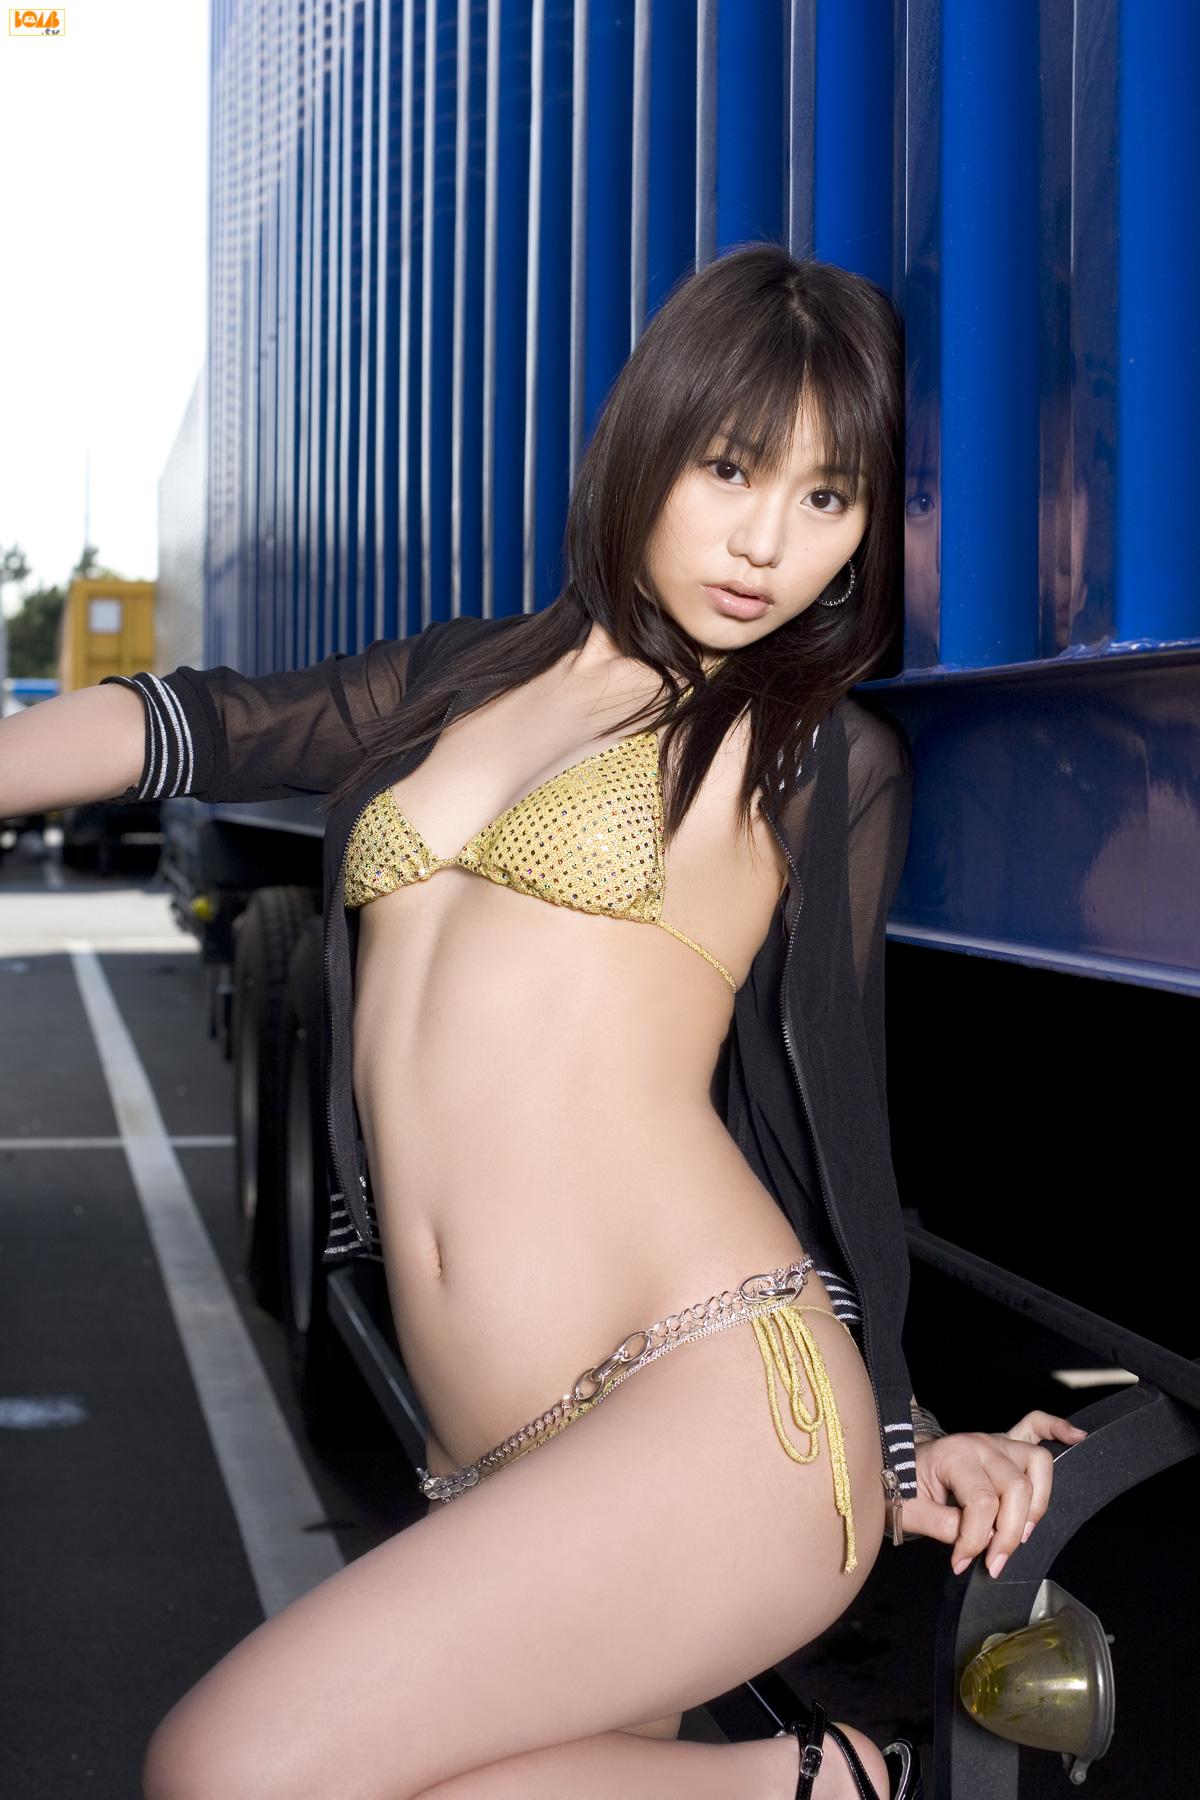 Hitomi Kaikawa - Bomb.tv 海川ひとみ - idols